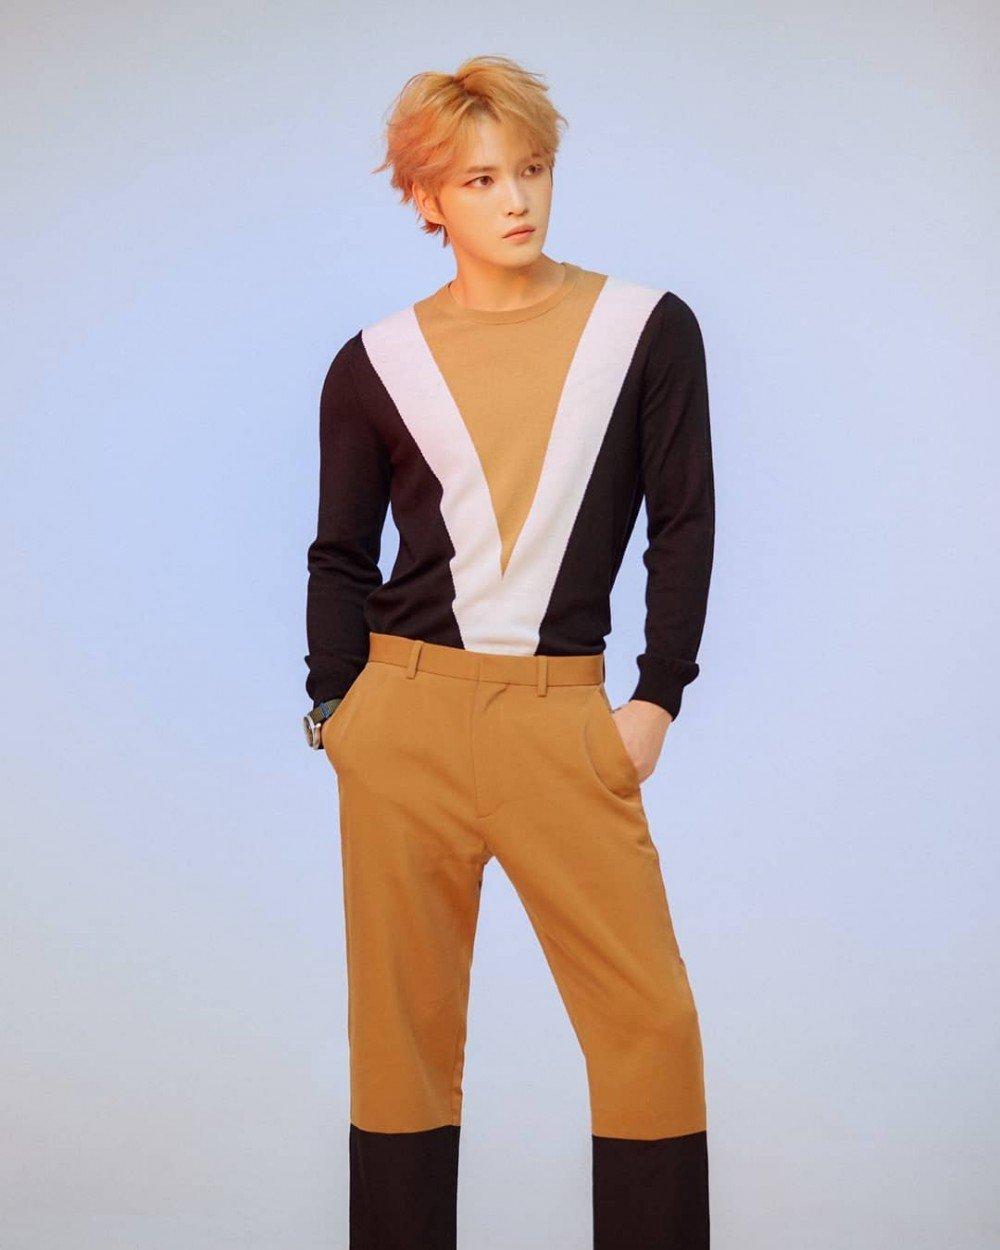 Jaejoong's recent Instagram update shows off his model-like proportions | allkpop